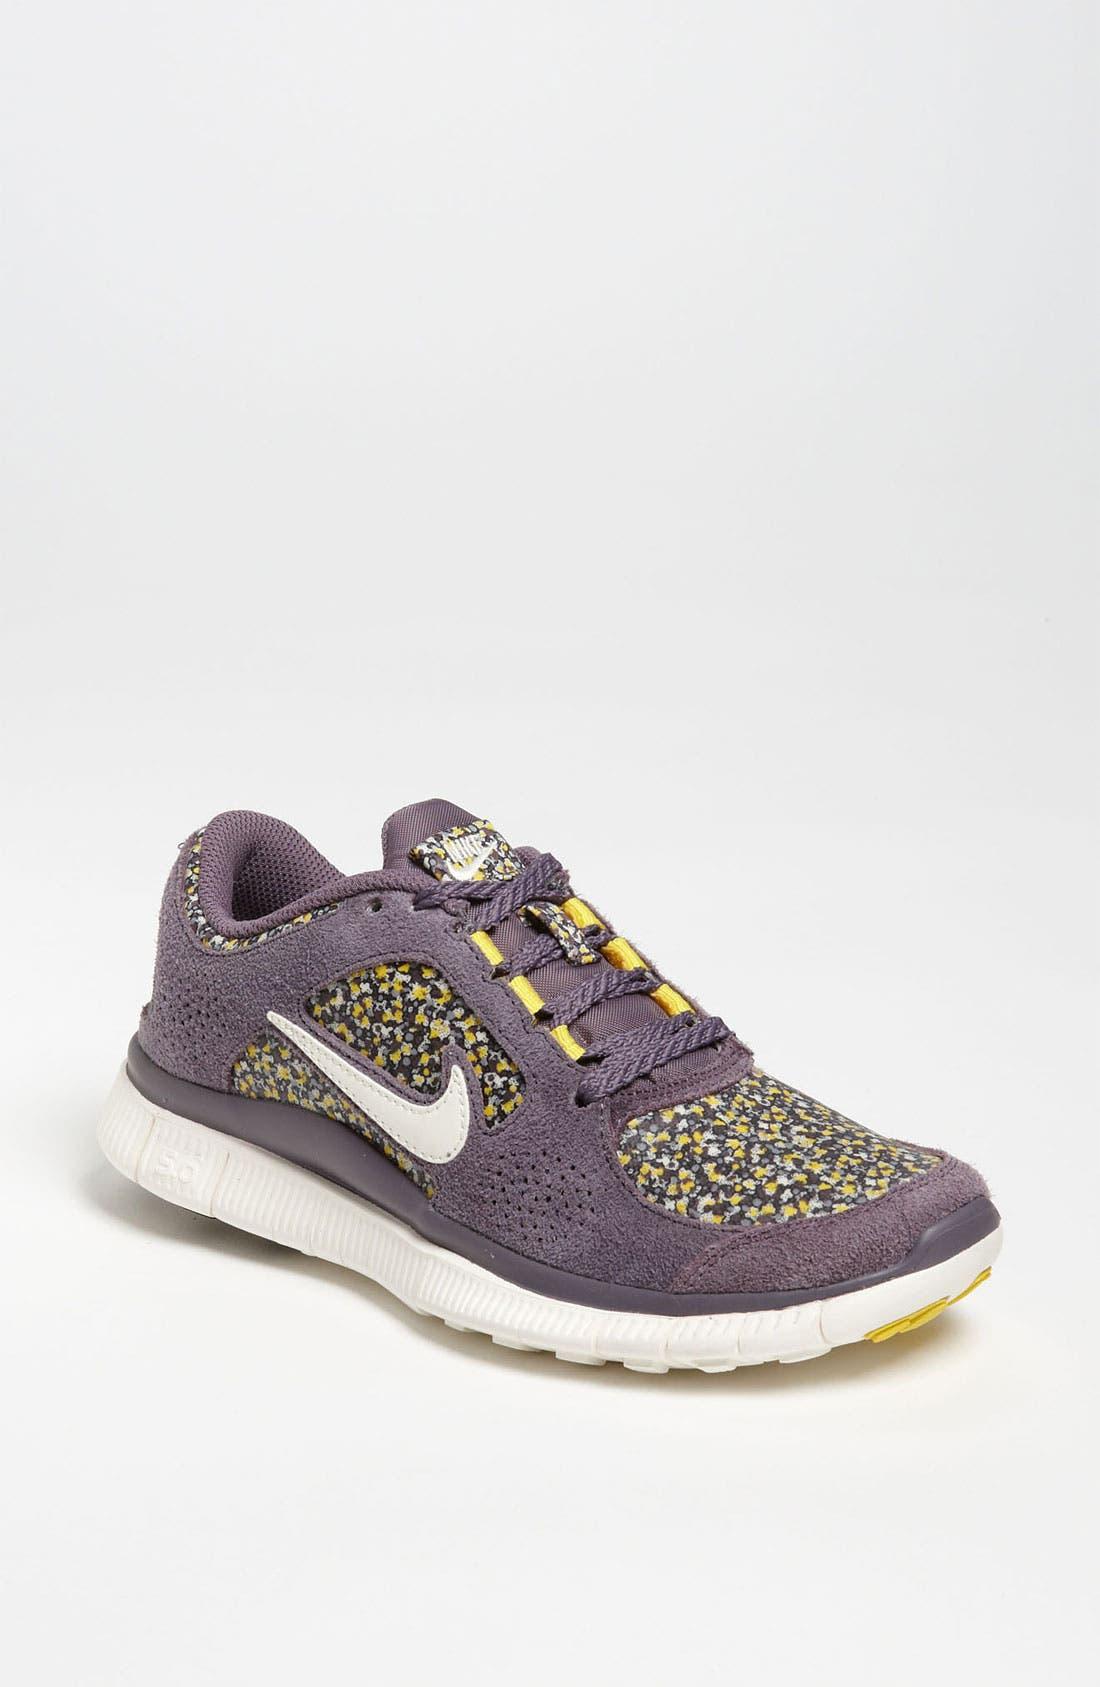 Alternate Image 1 Selected - Nike 'Free Run 3 Liberty' Sneaker (Women)